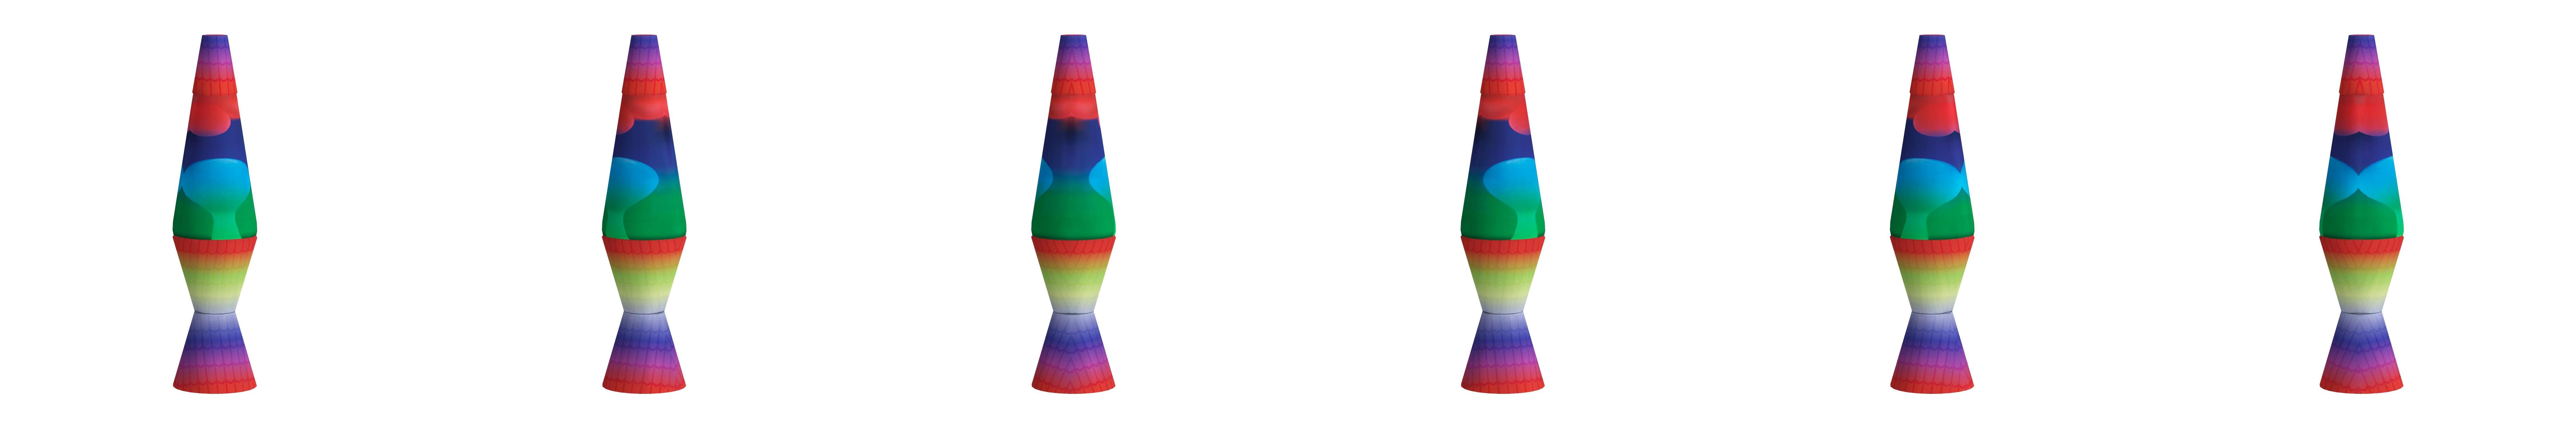 25 Watt Light Lava Lampen Schlafzimmerlampe Sensorische Lichter Color : Purple//Blue Rainbow Lava-Lampen f/ür Kinder